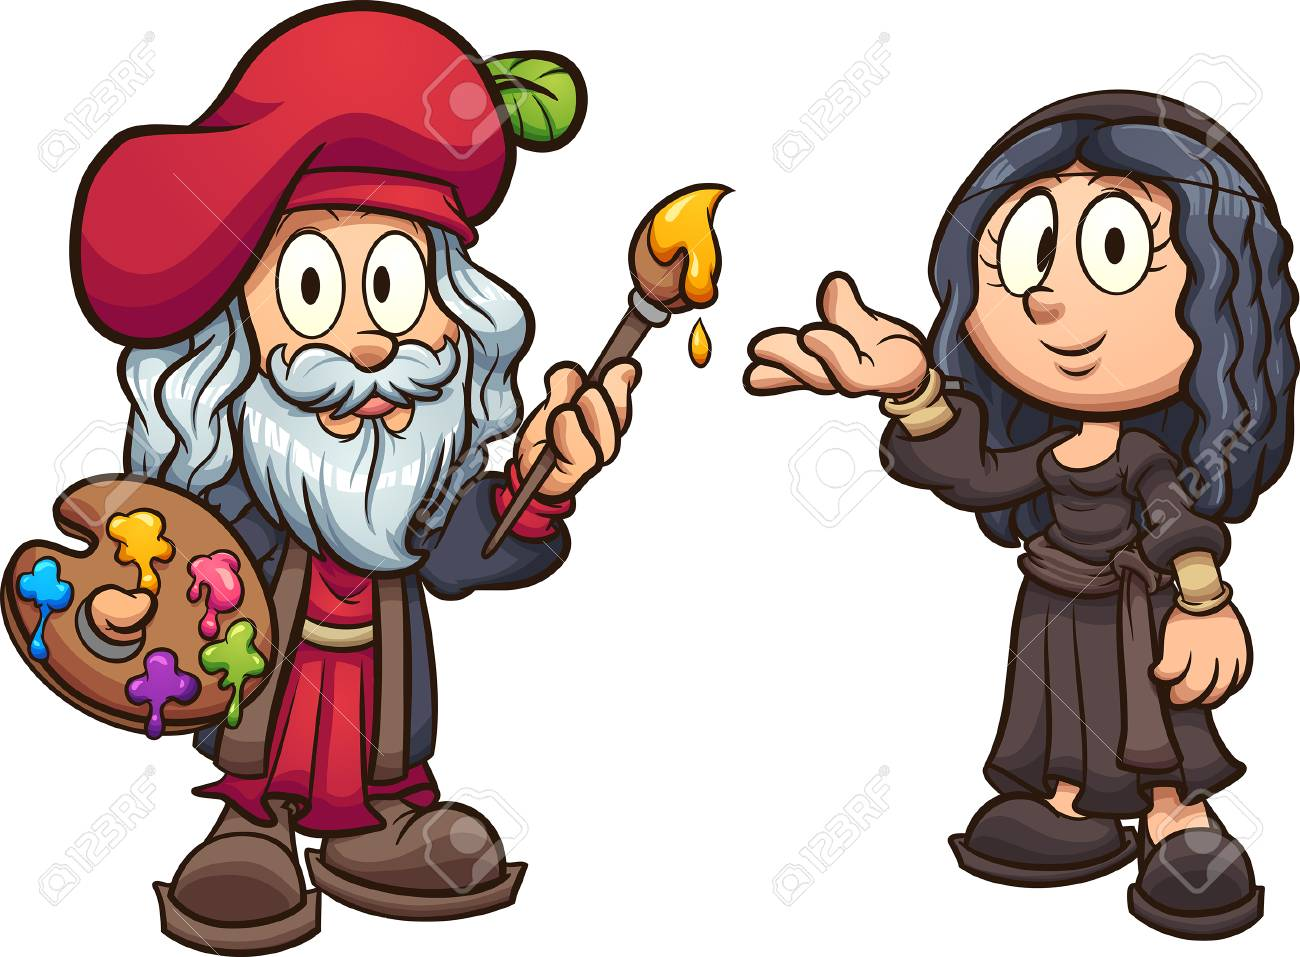 Cartoon boy and girl disguised as Leonardo da Vinci and the Mona...